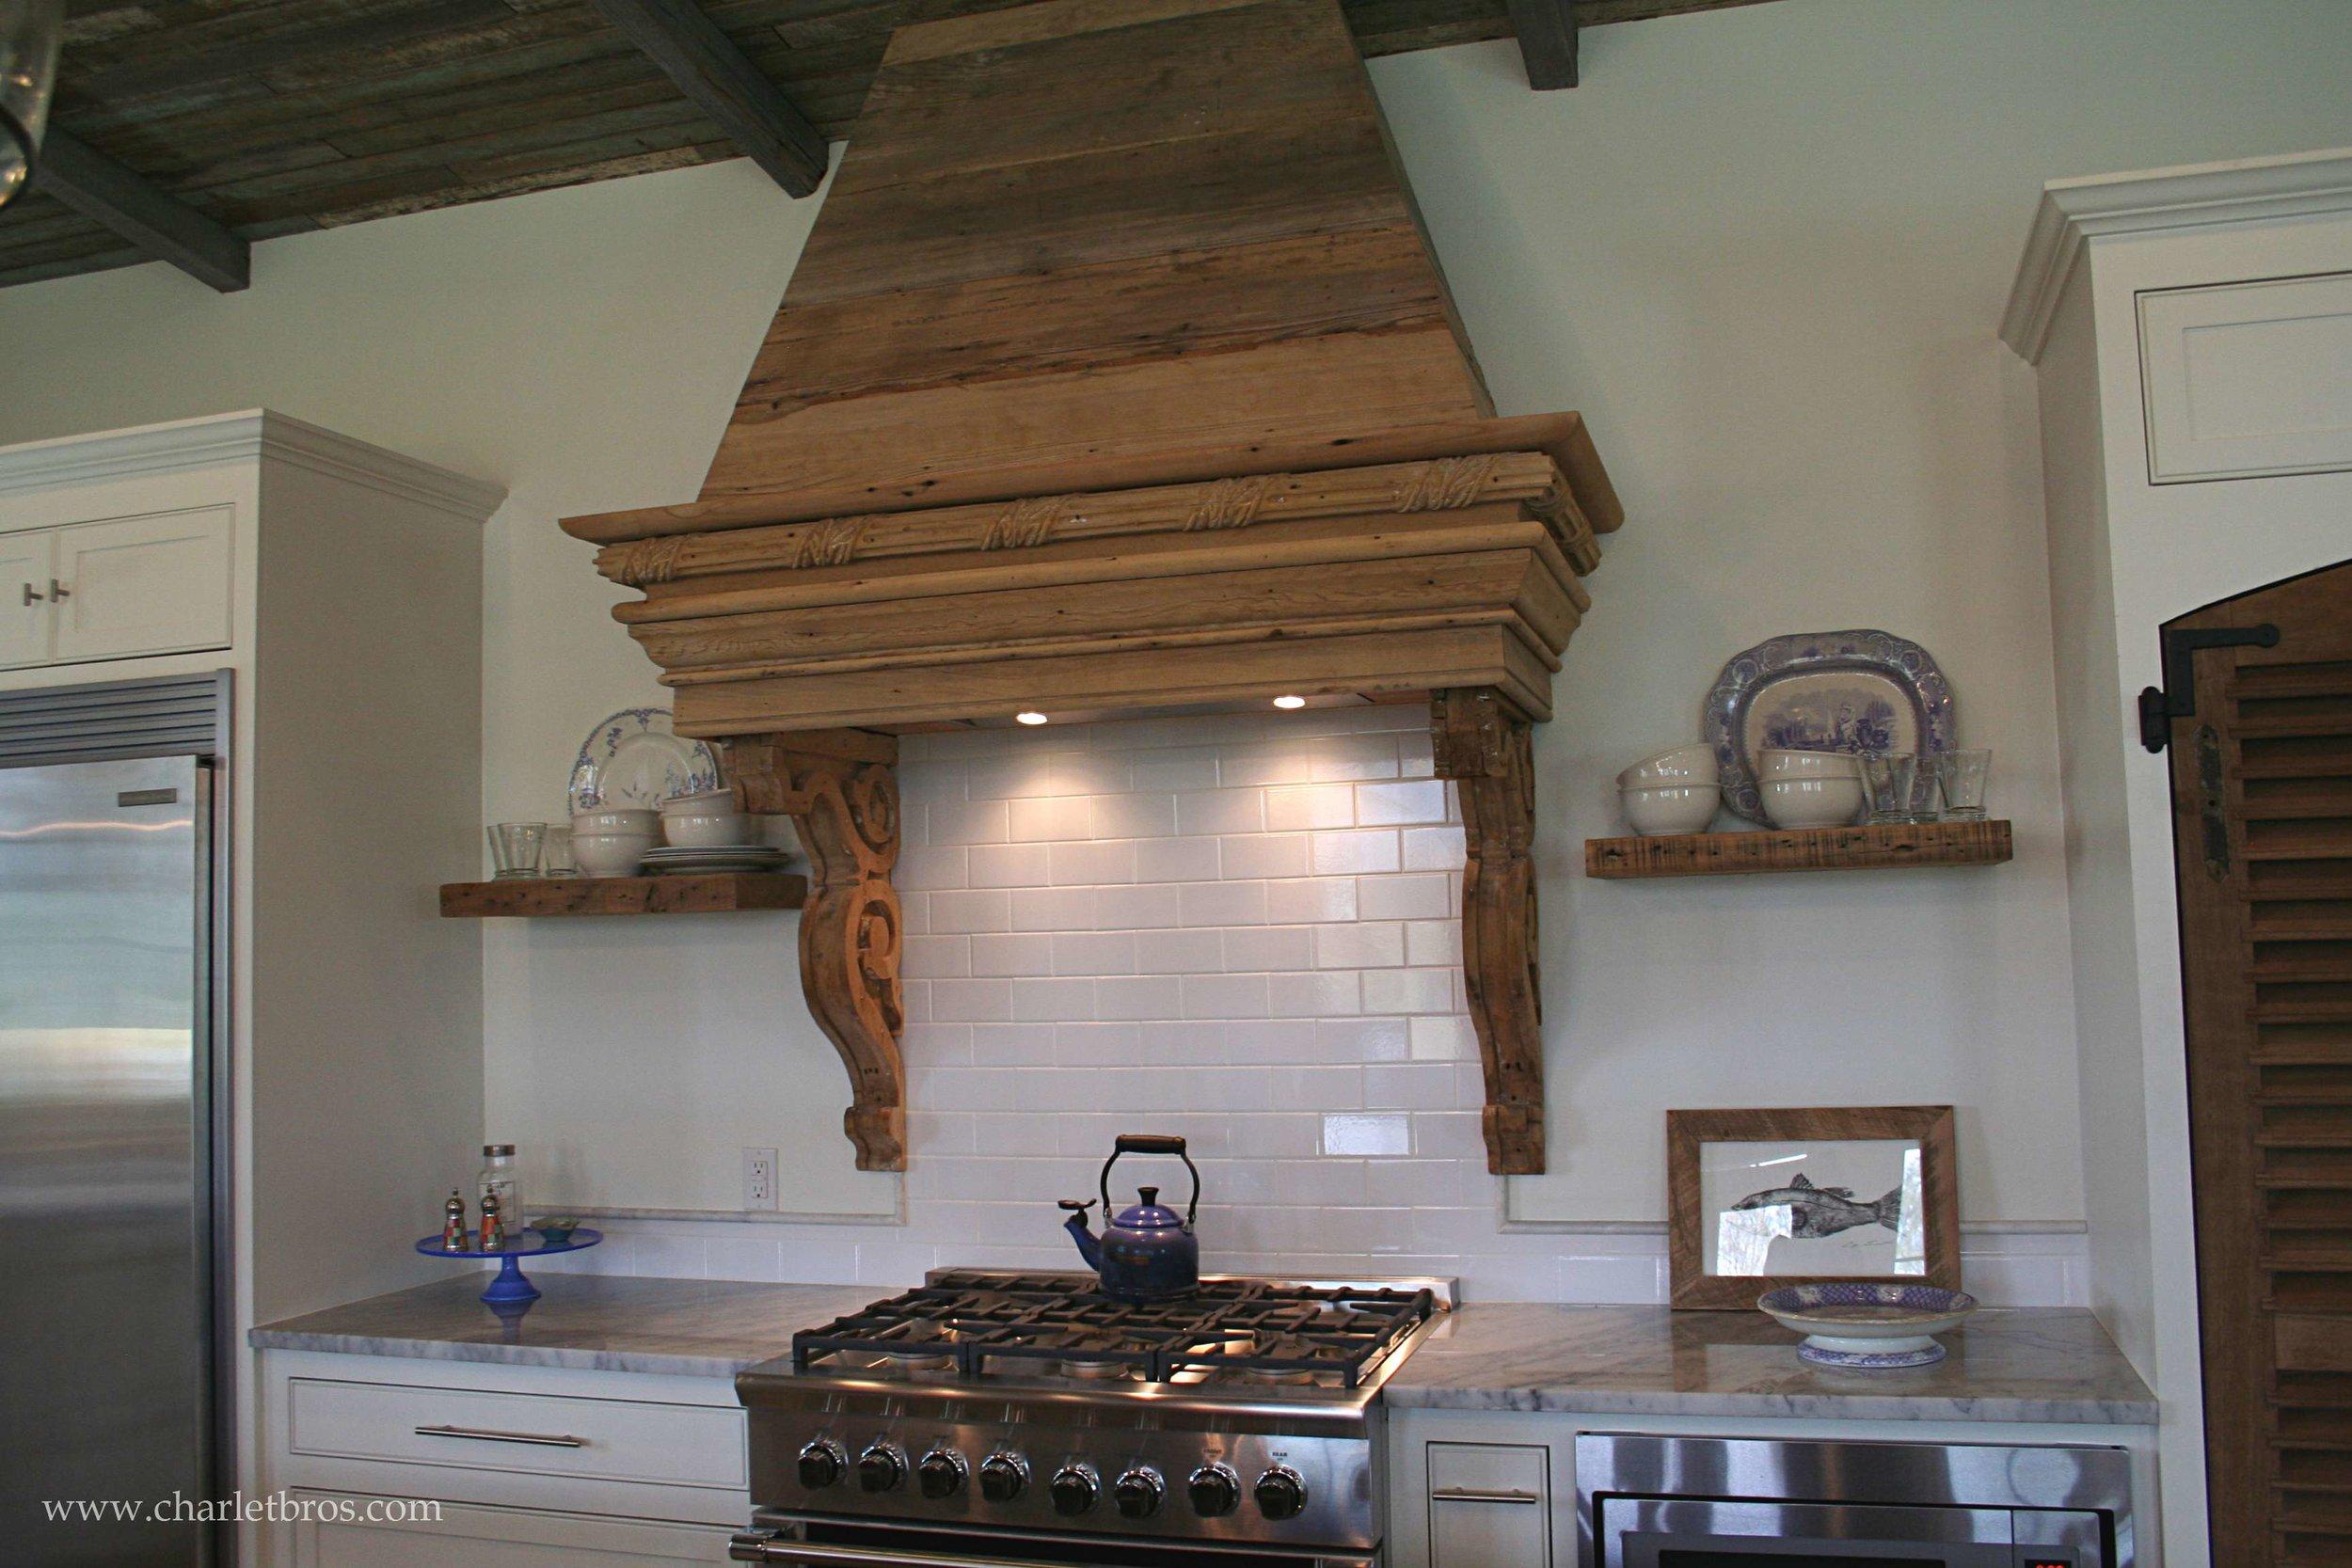 Clairemont cooktop hood F.jpg